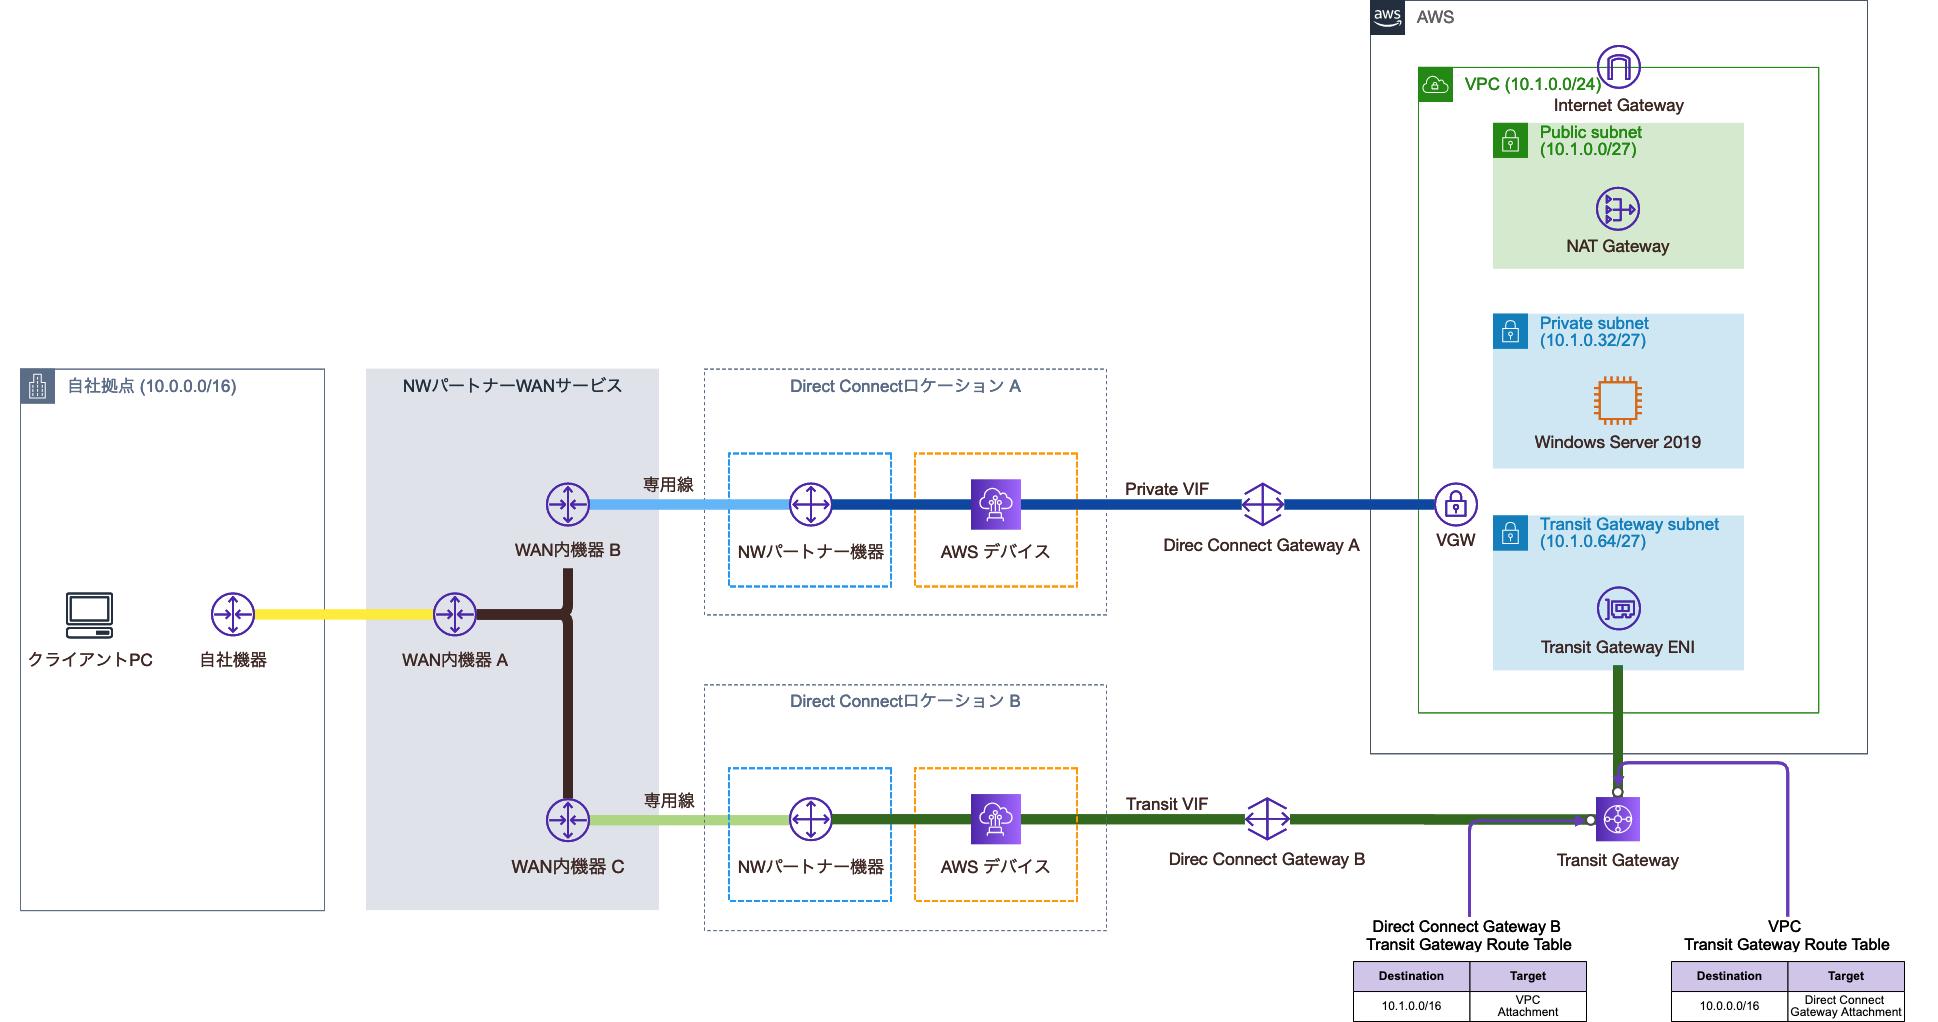 Transit Gateway Route TableとTransit Gateway Attachmentの関連付け後の構成図